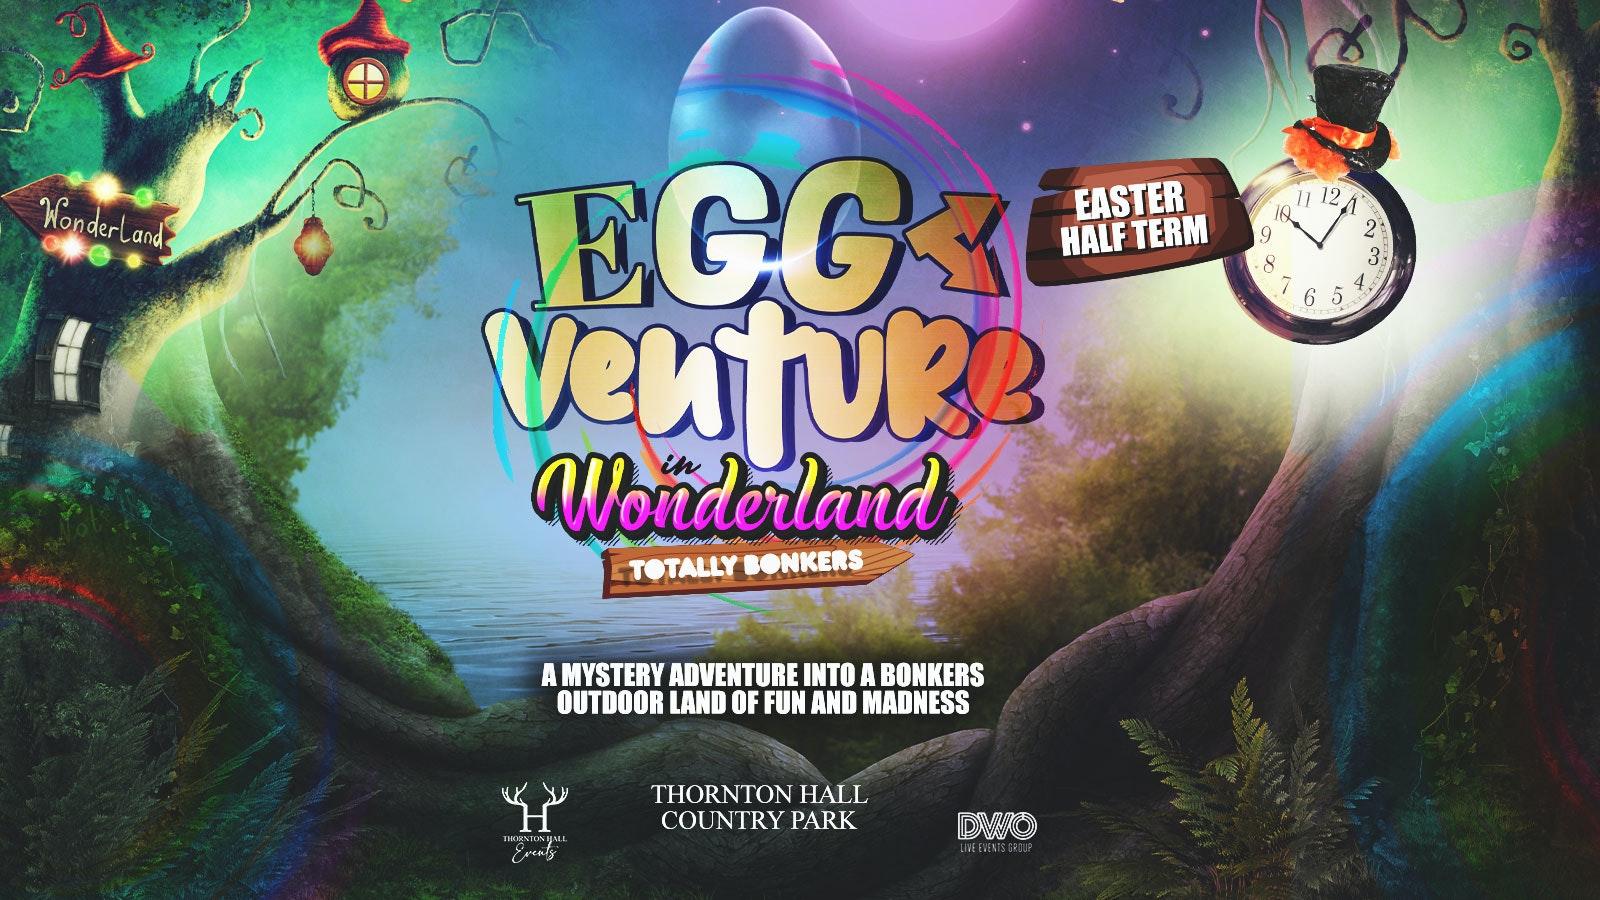 EggVenture in Wonderland – Friday 9th April – 3pm